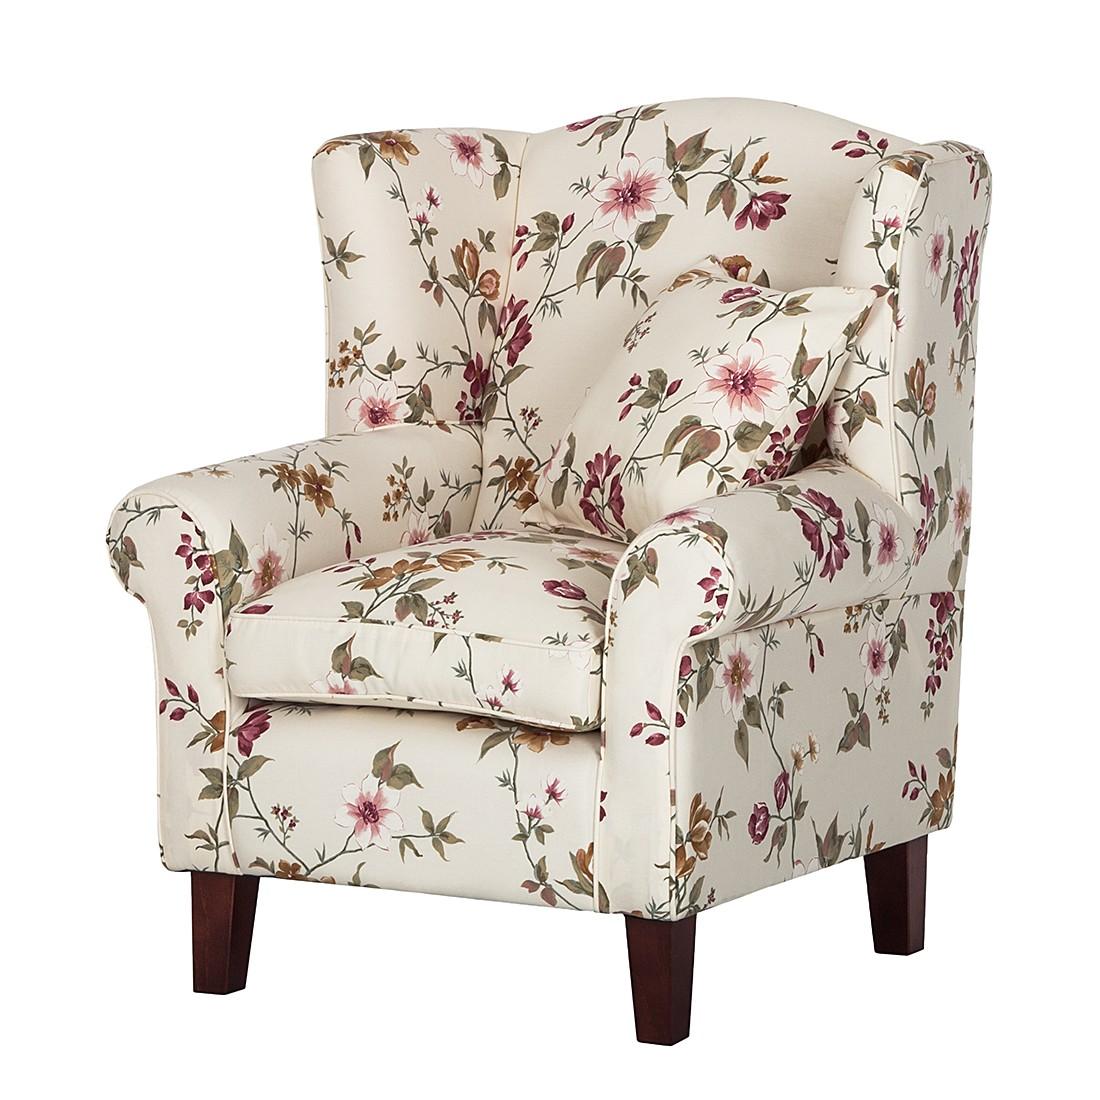 Fauteuil Red Rose - Tissu fleur beige - Sans repose-pieds, Maison Belfort